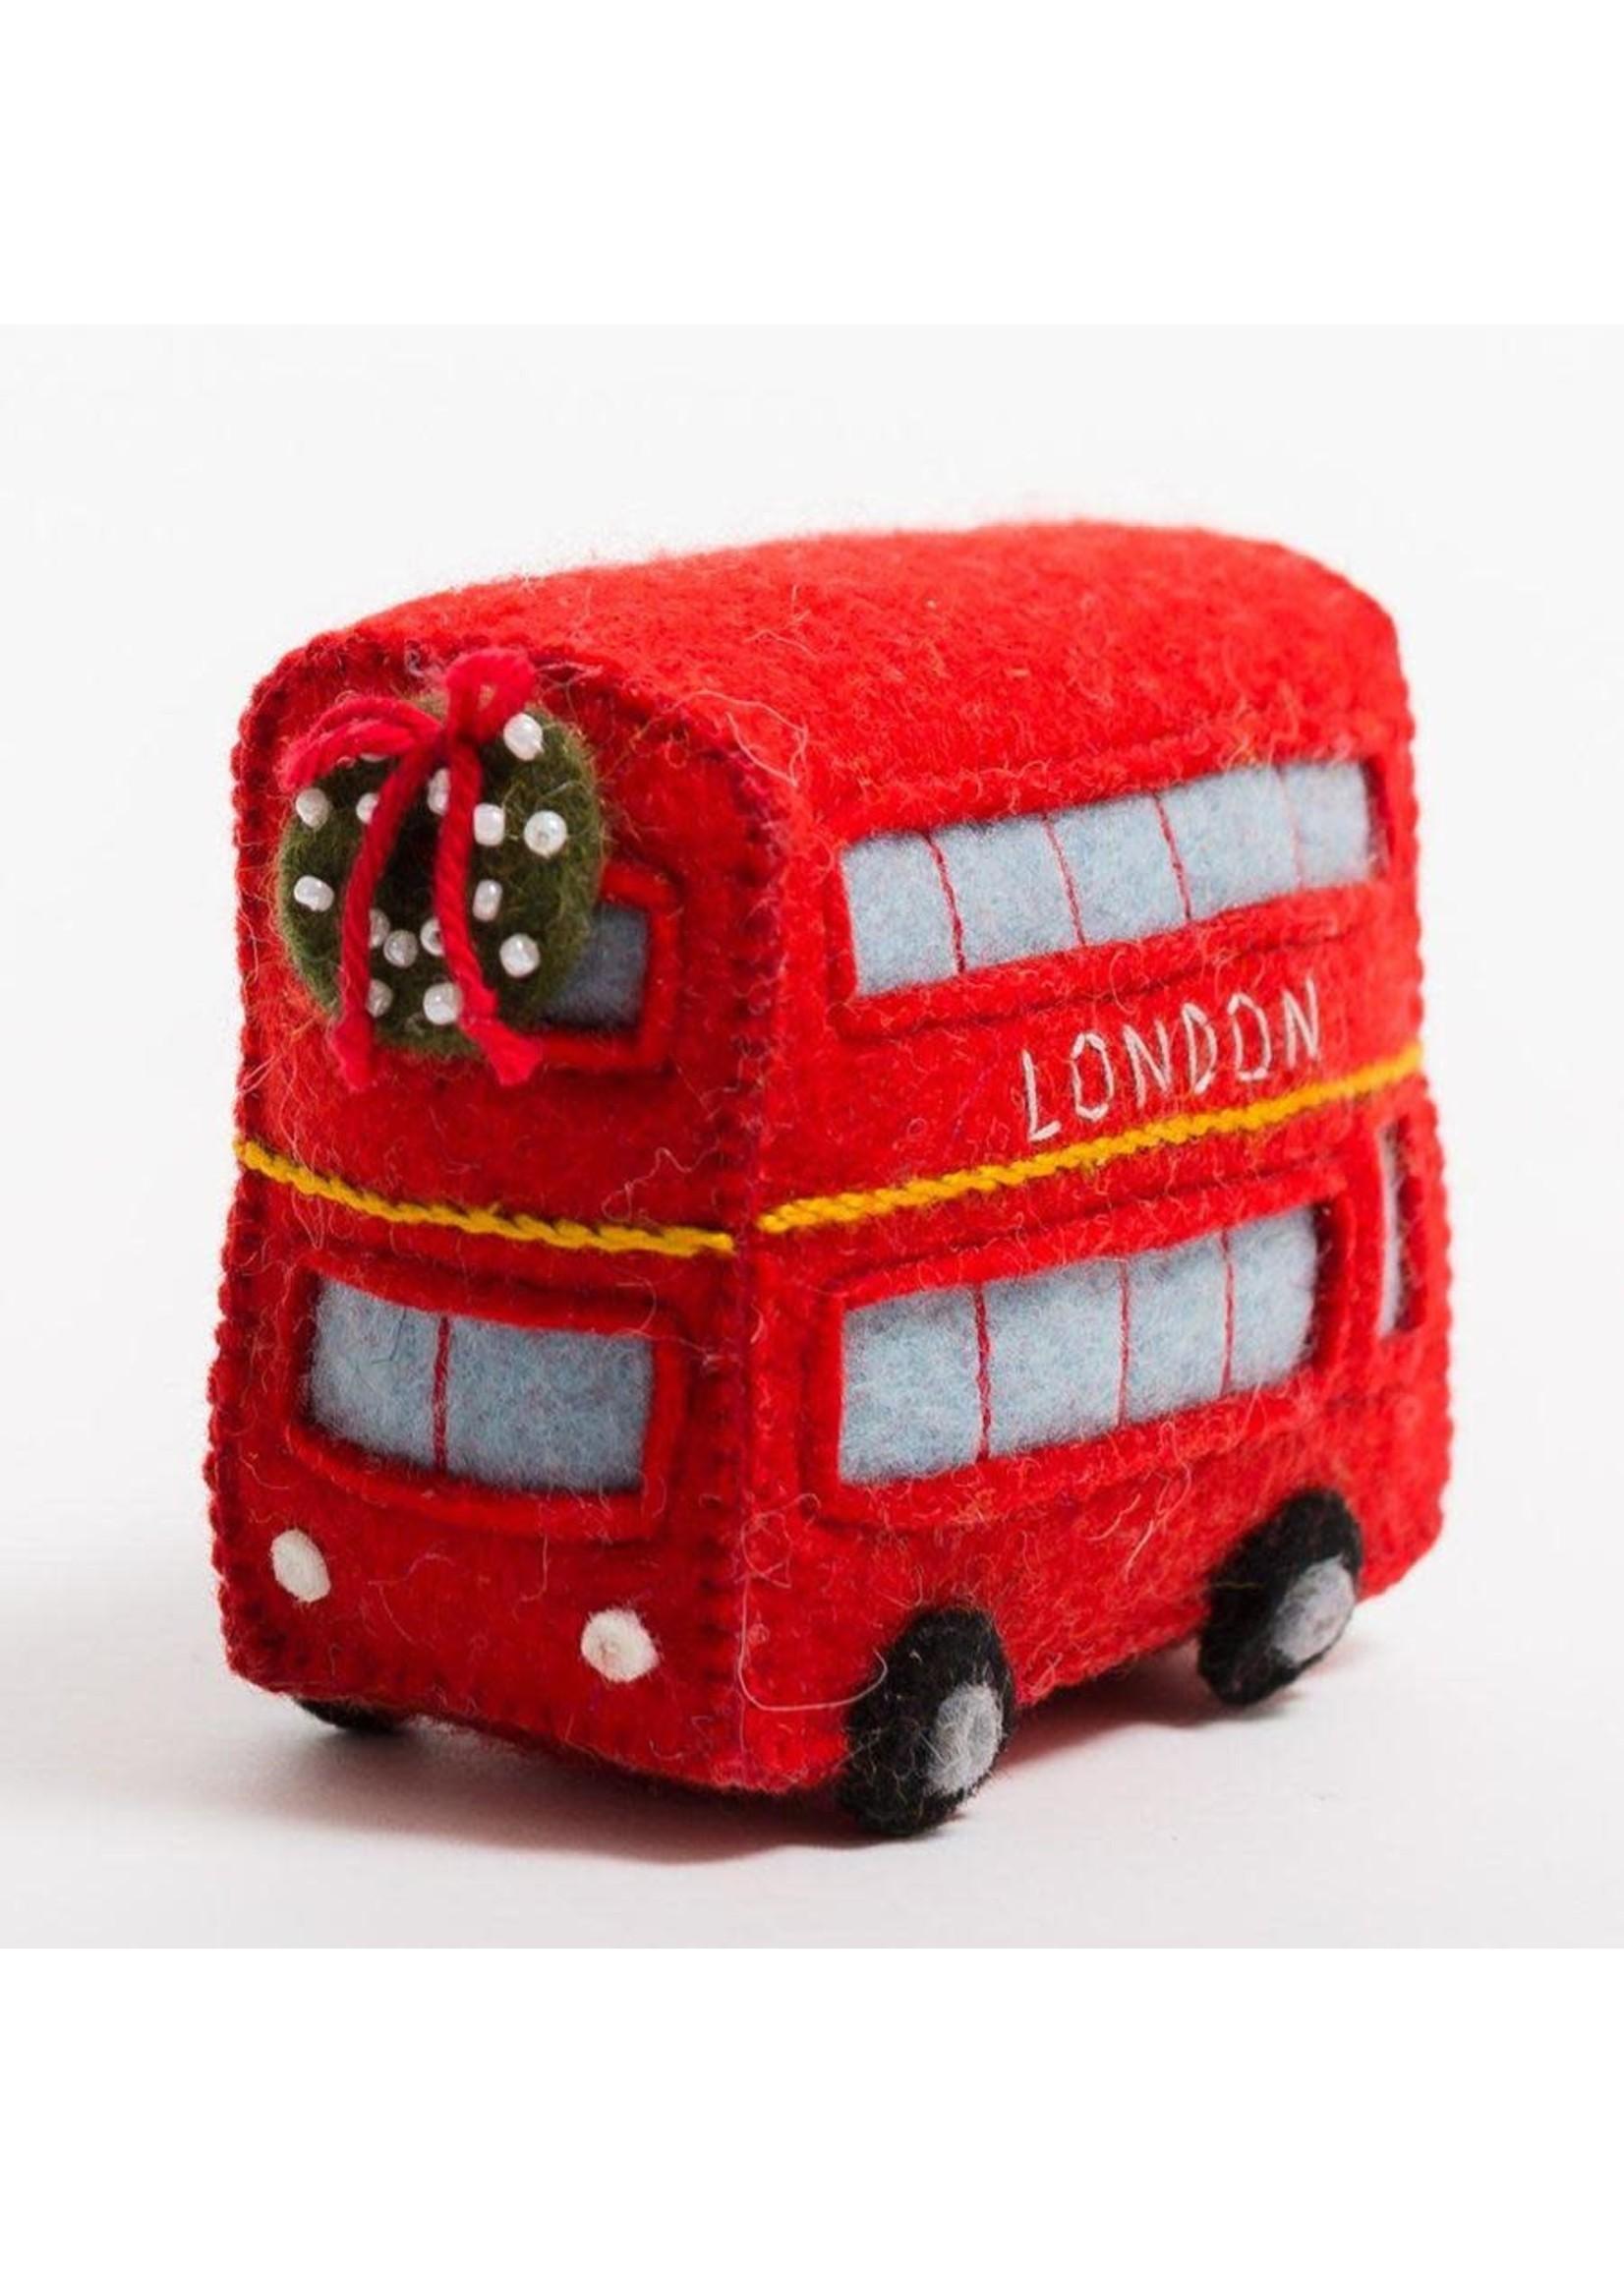 Ornament - London Double Decker